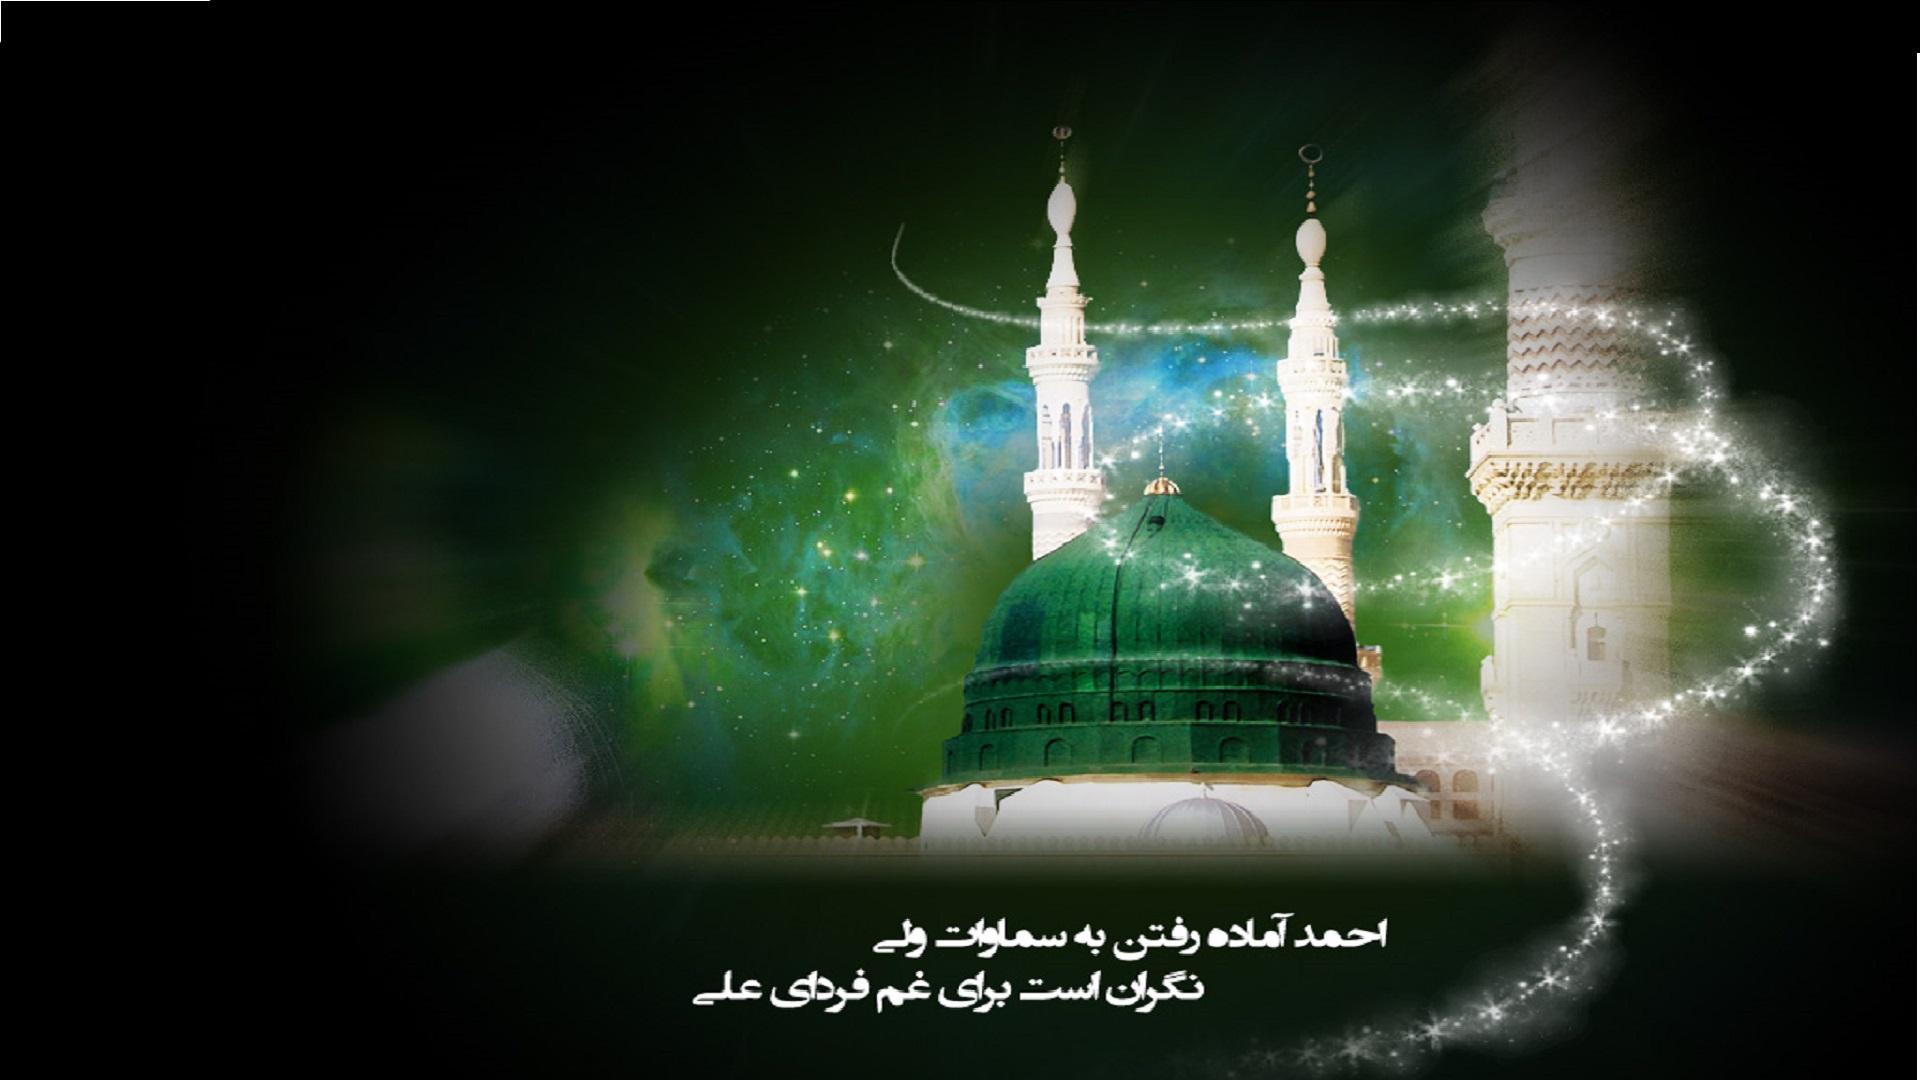 Most Beautiful Wallpaper Free Hd Madina Shareef Hd Wallpaper